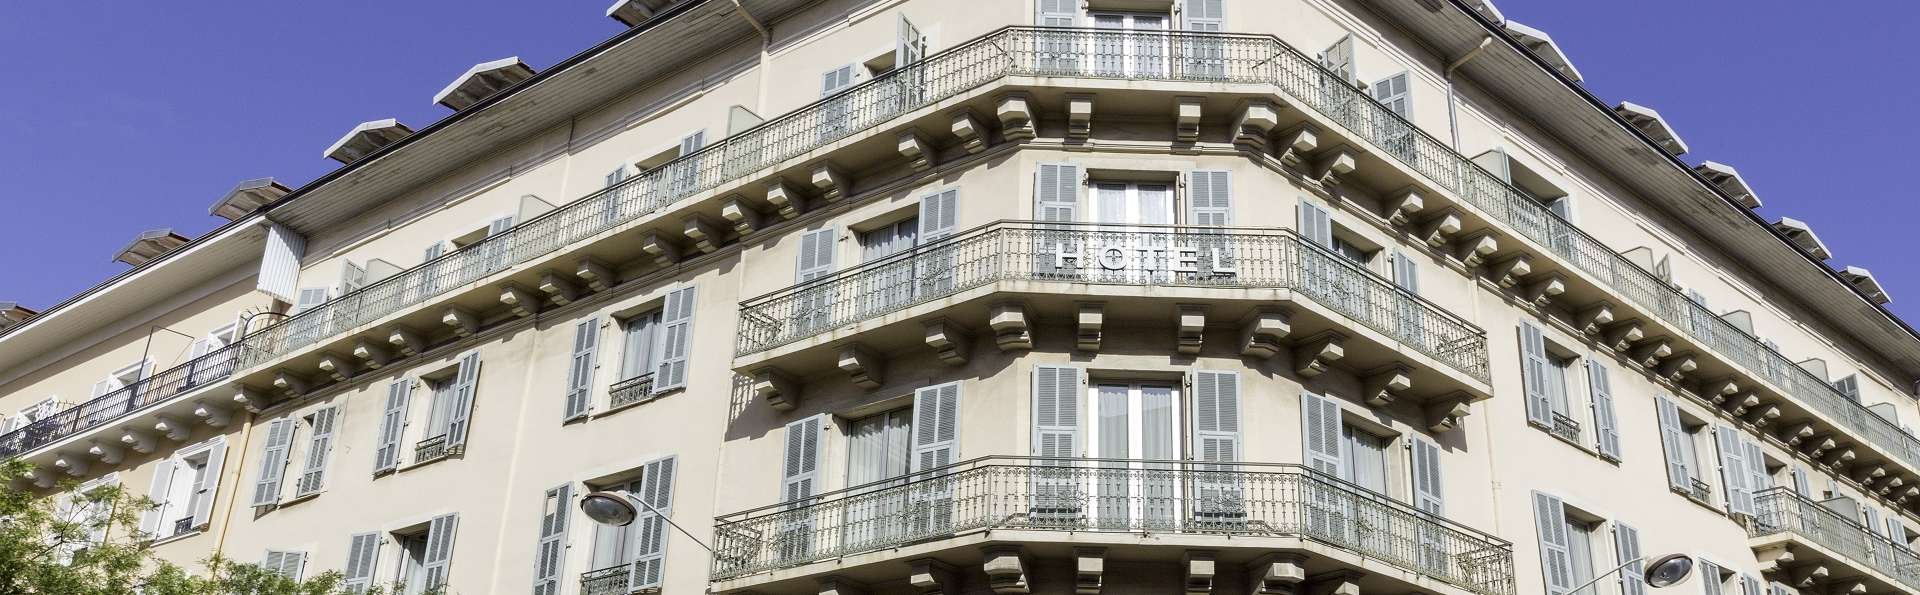 Best Western Premier Hôtel Roosevelt - BWP_-_Exterieur_Facade_5.jpg